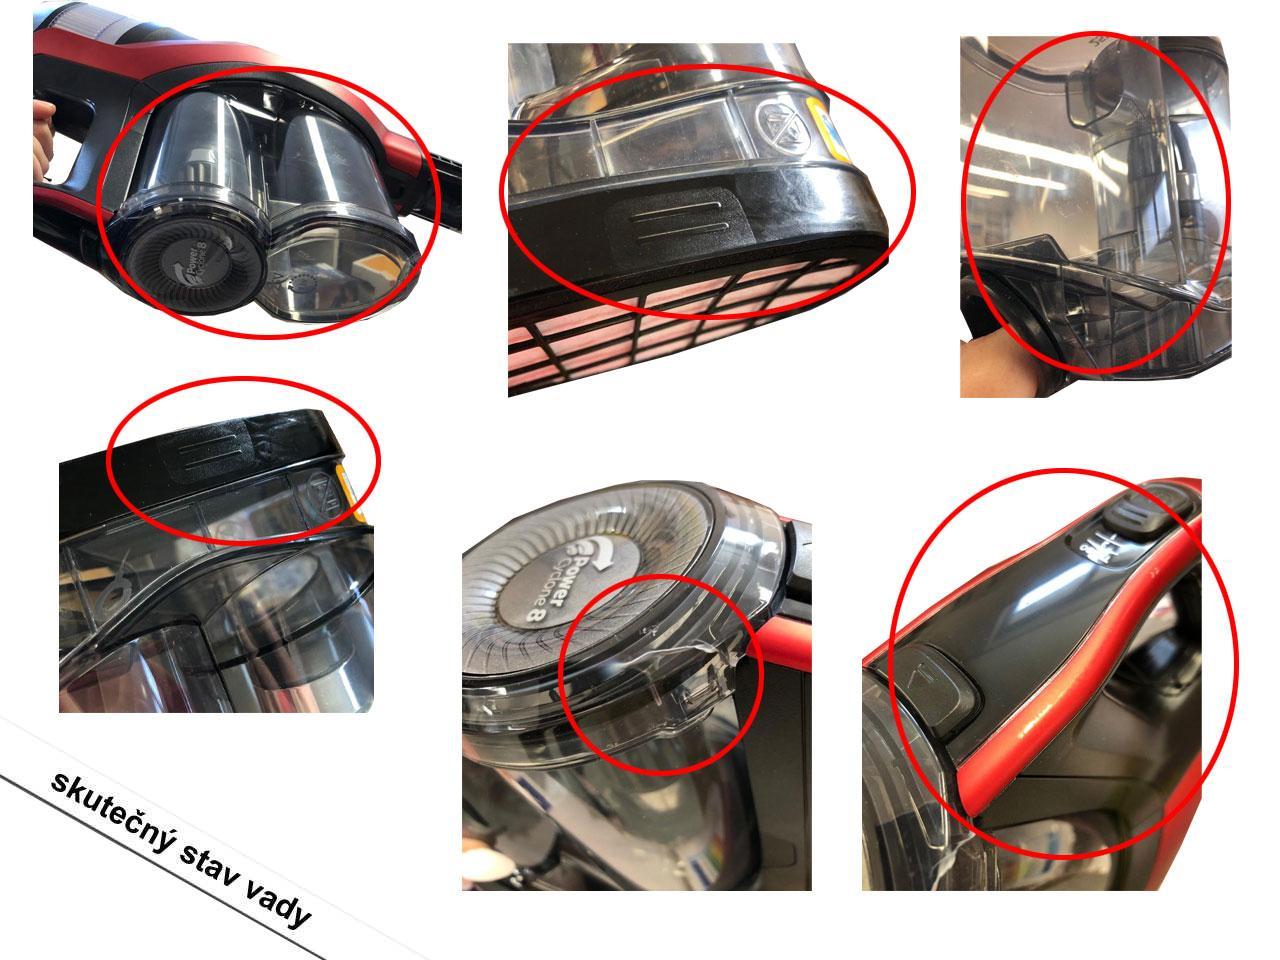 PHILIPS FC6823/01 SpeedPro Max